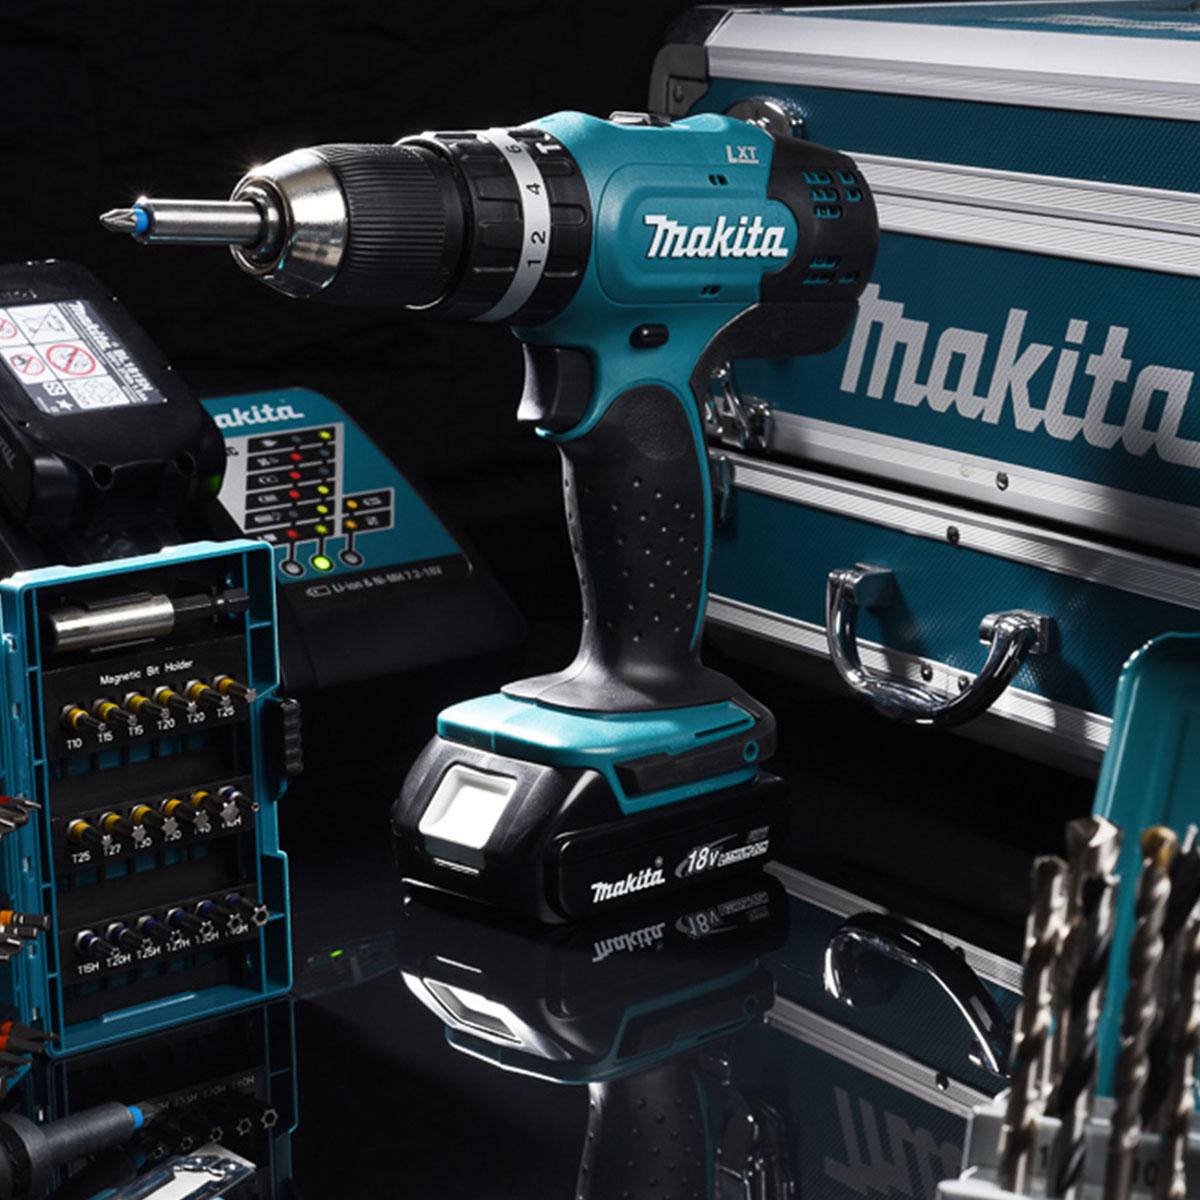 atelier fotograf in ravensburg makita bohrmaschine toolset 20180918.jpg